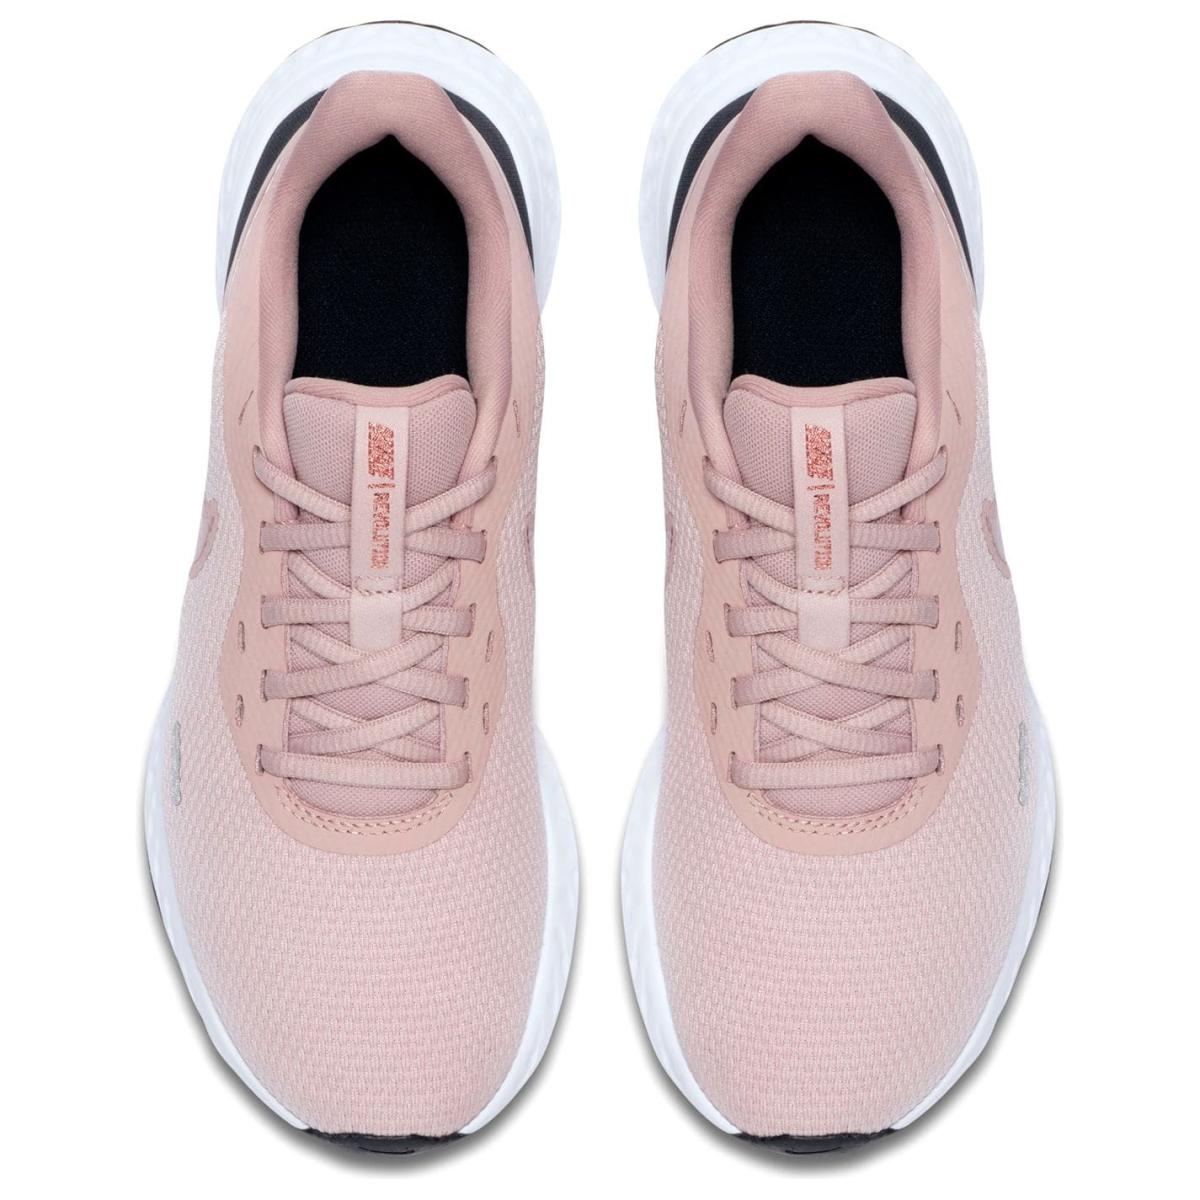 Nike-Revolution-Turnschuhe-Damen-Sneaker-Sportschuhe-Laufschuhe-1160 Indexbild 52